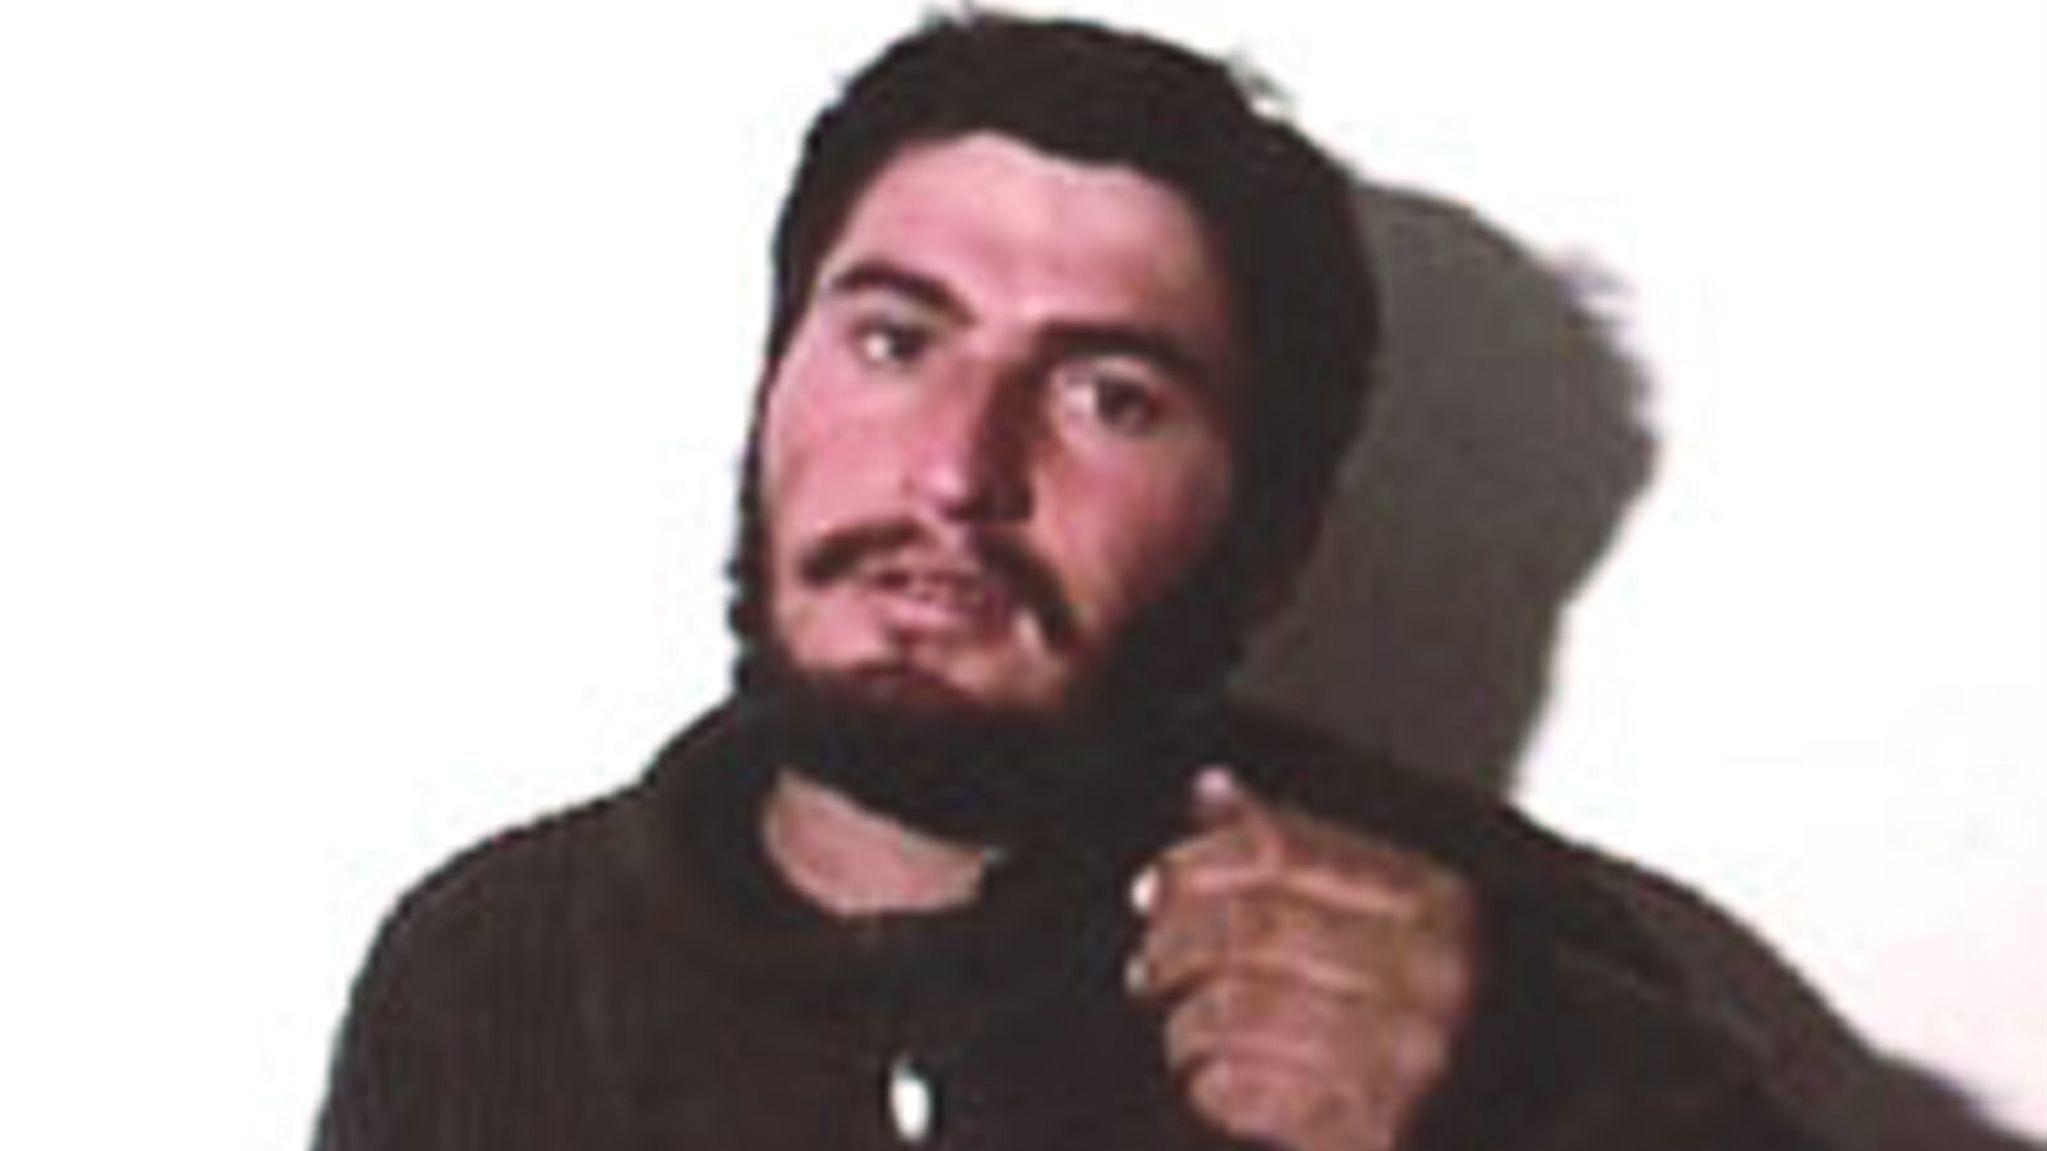 Persian Gulf Al Qaeda Leader Captured By US Authorities